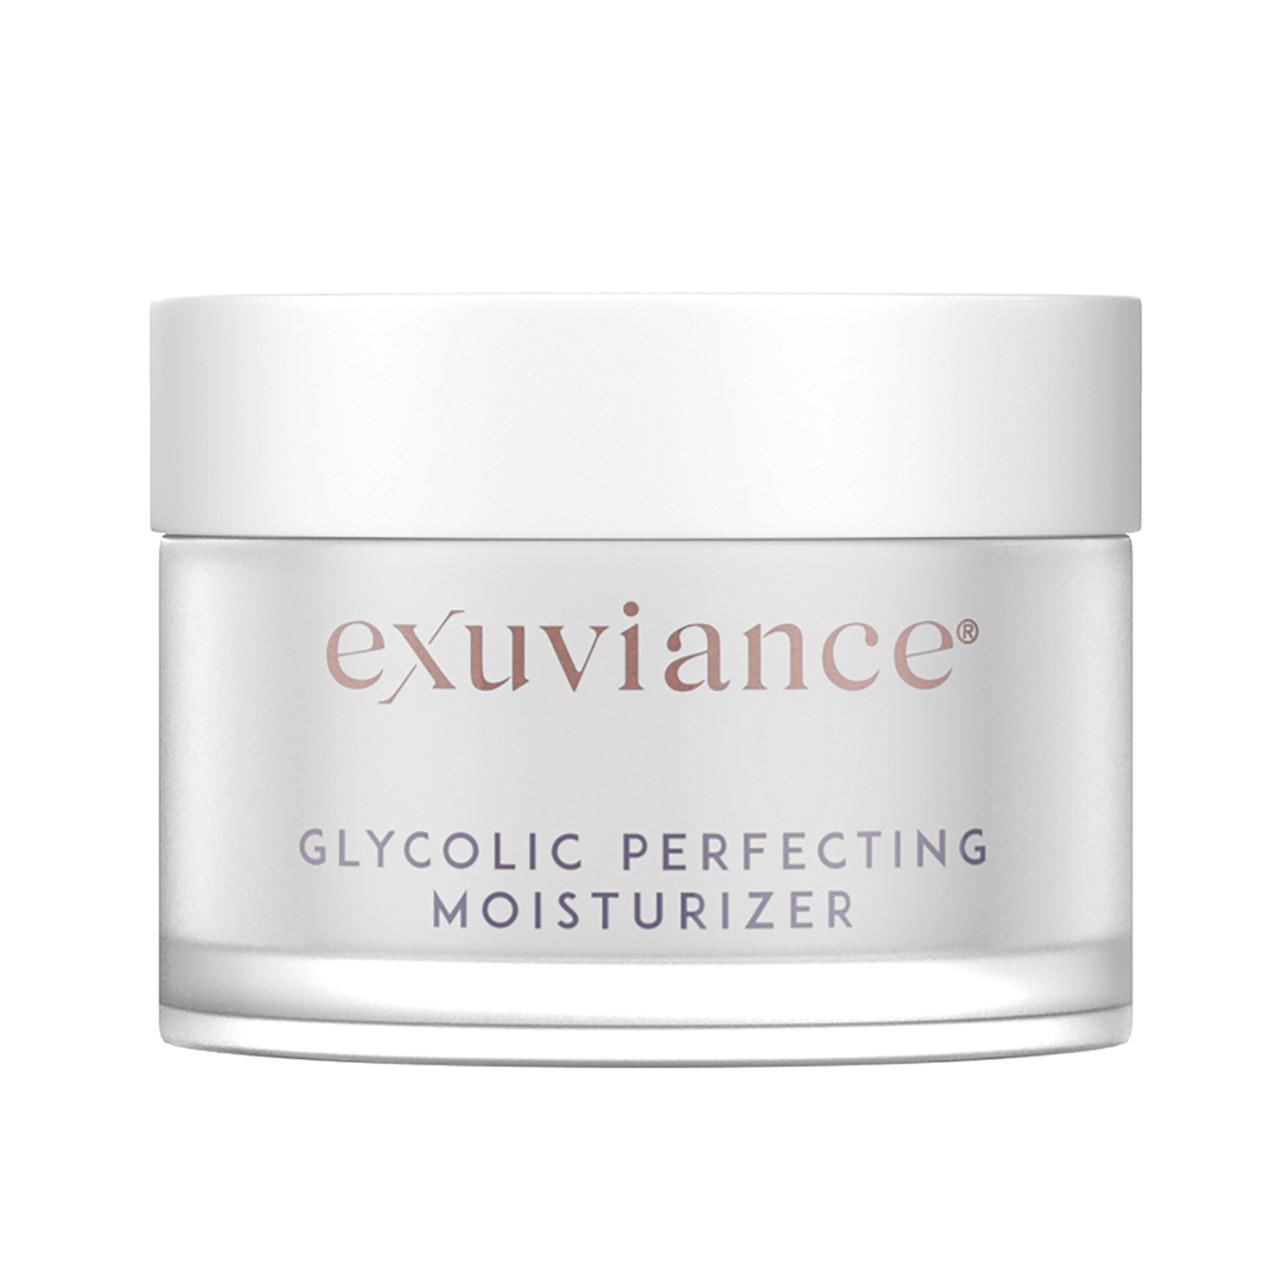 Exuviance Glycolic Perfecting Moisturizer (PM)